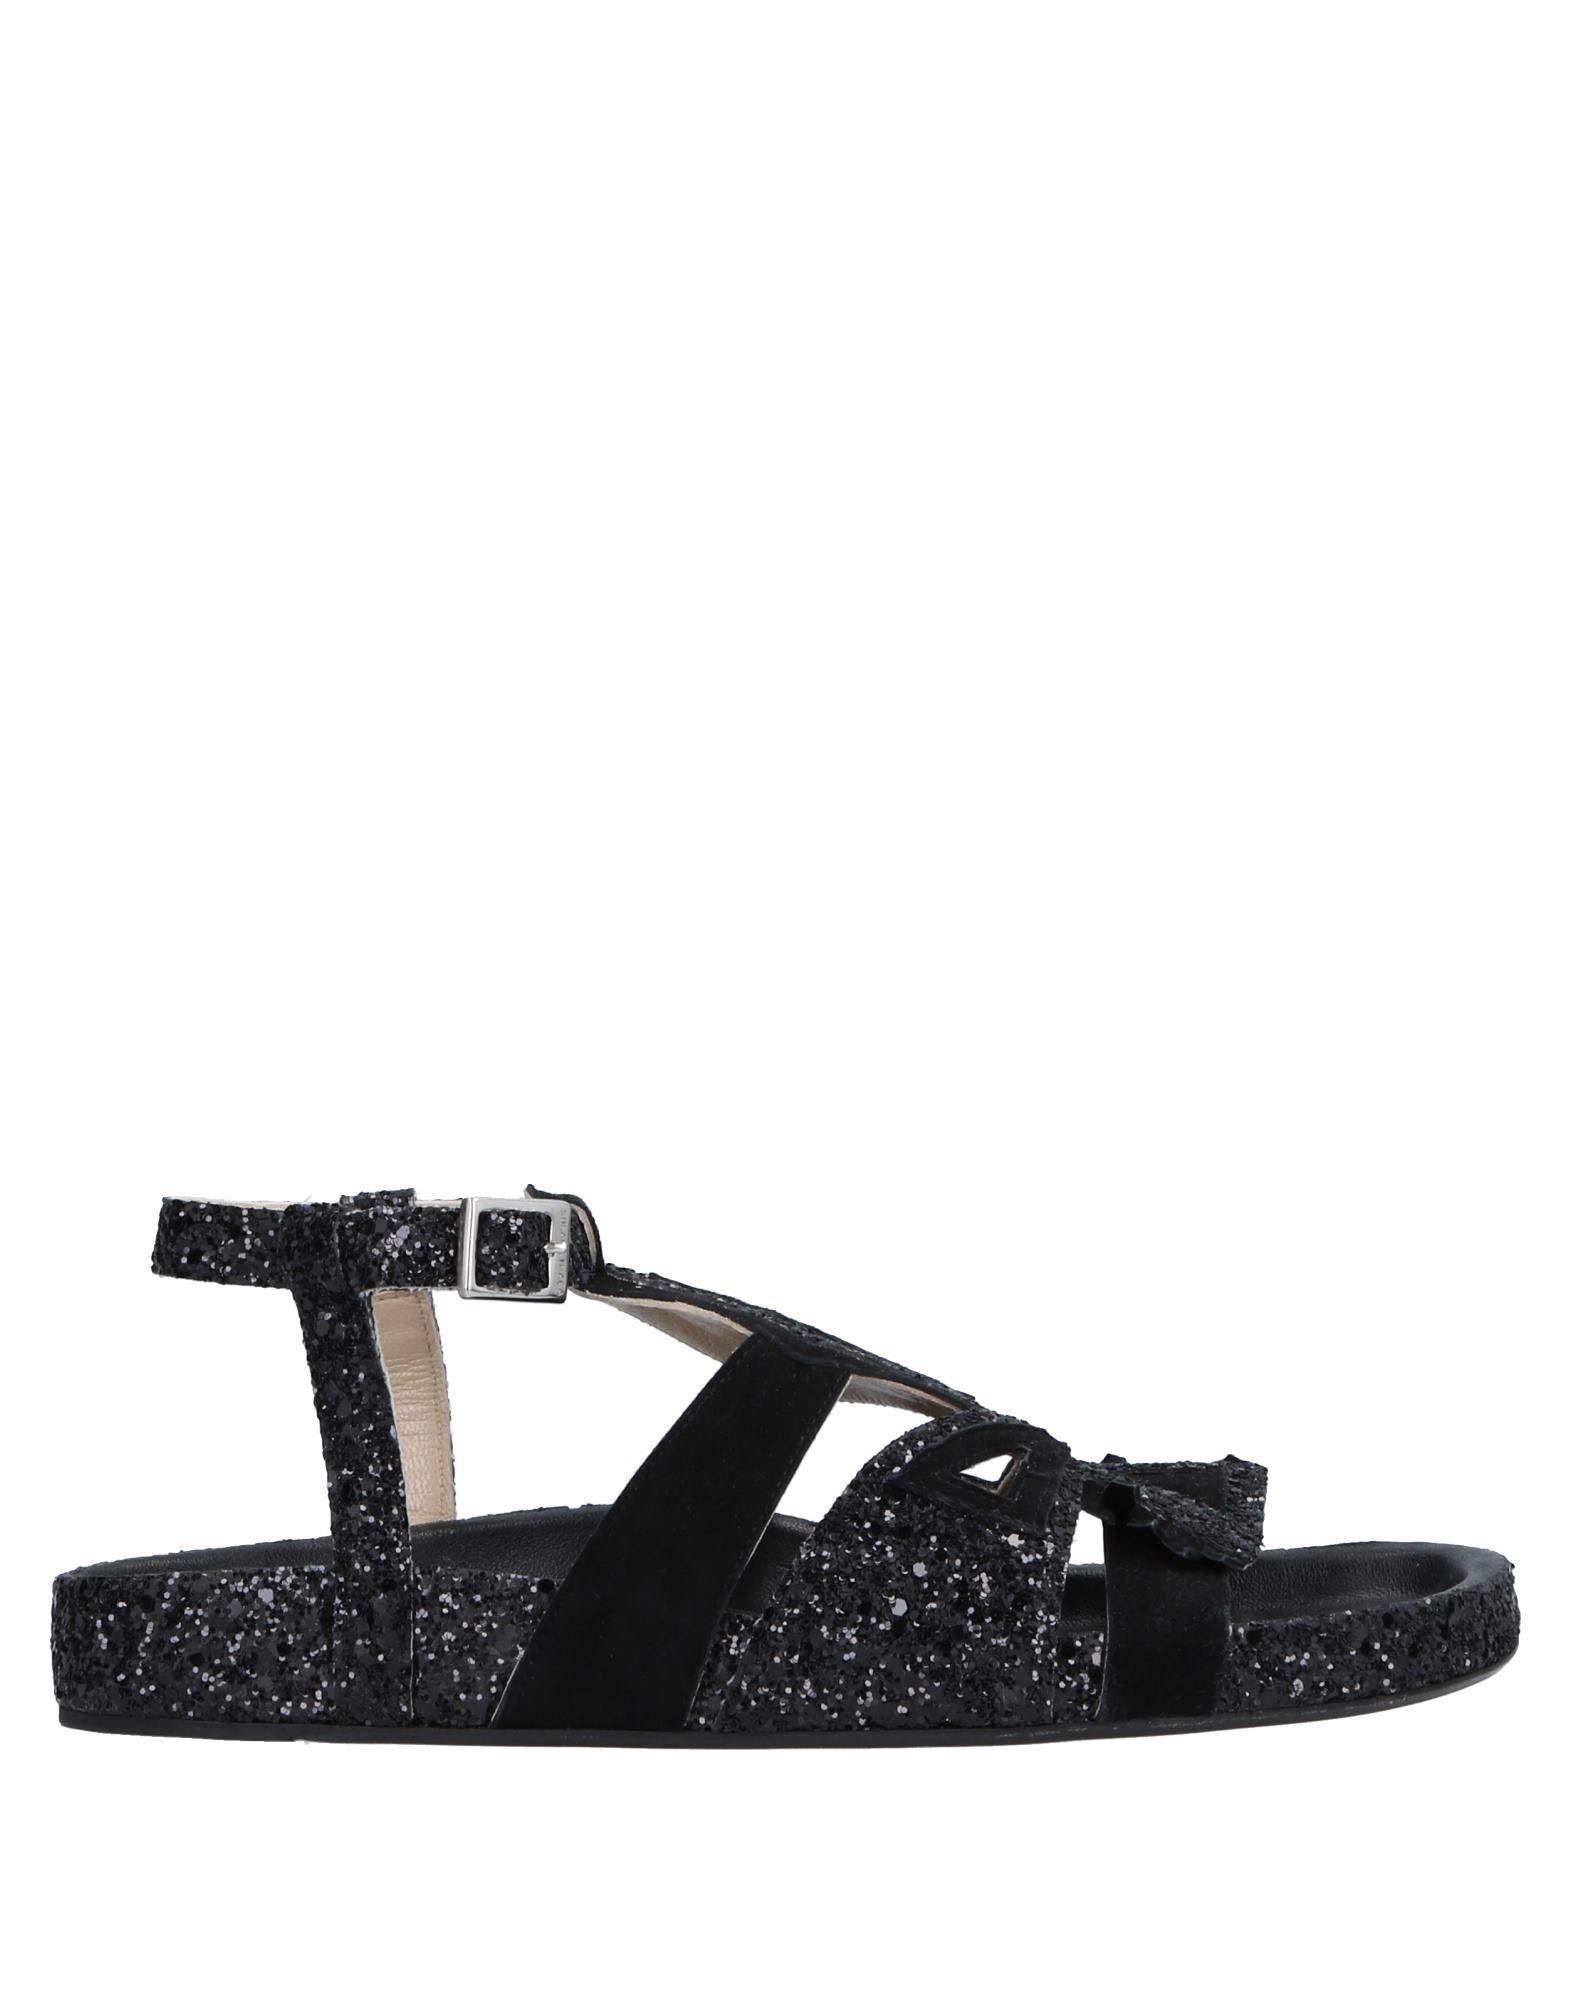 Susana Traca Sandalen Damen  11515678QB Gute Qualität beliebte Schuhe